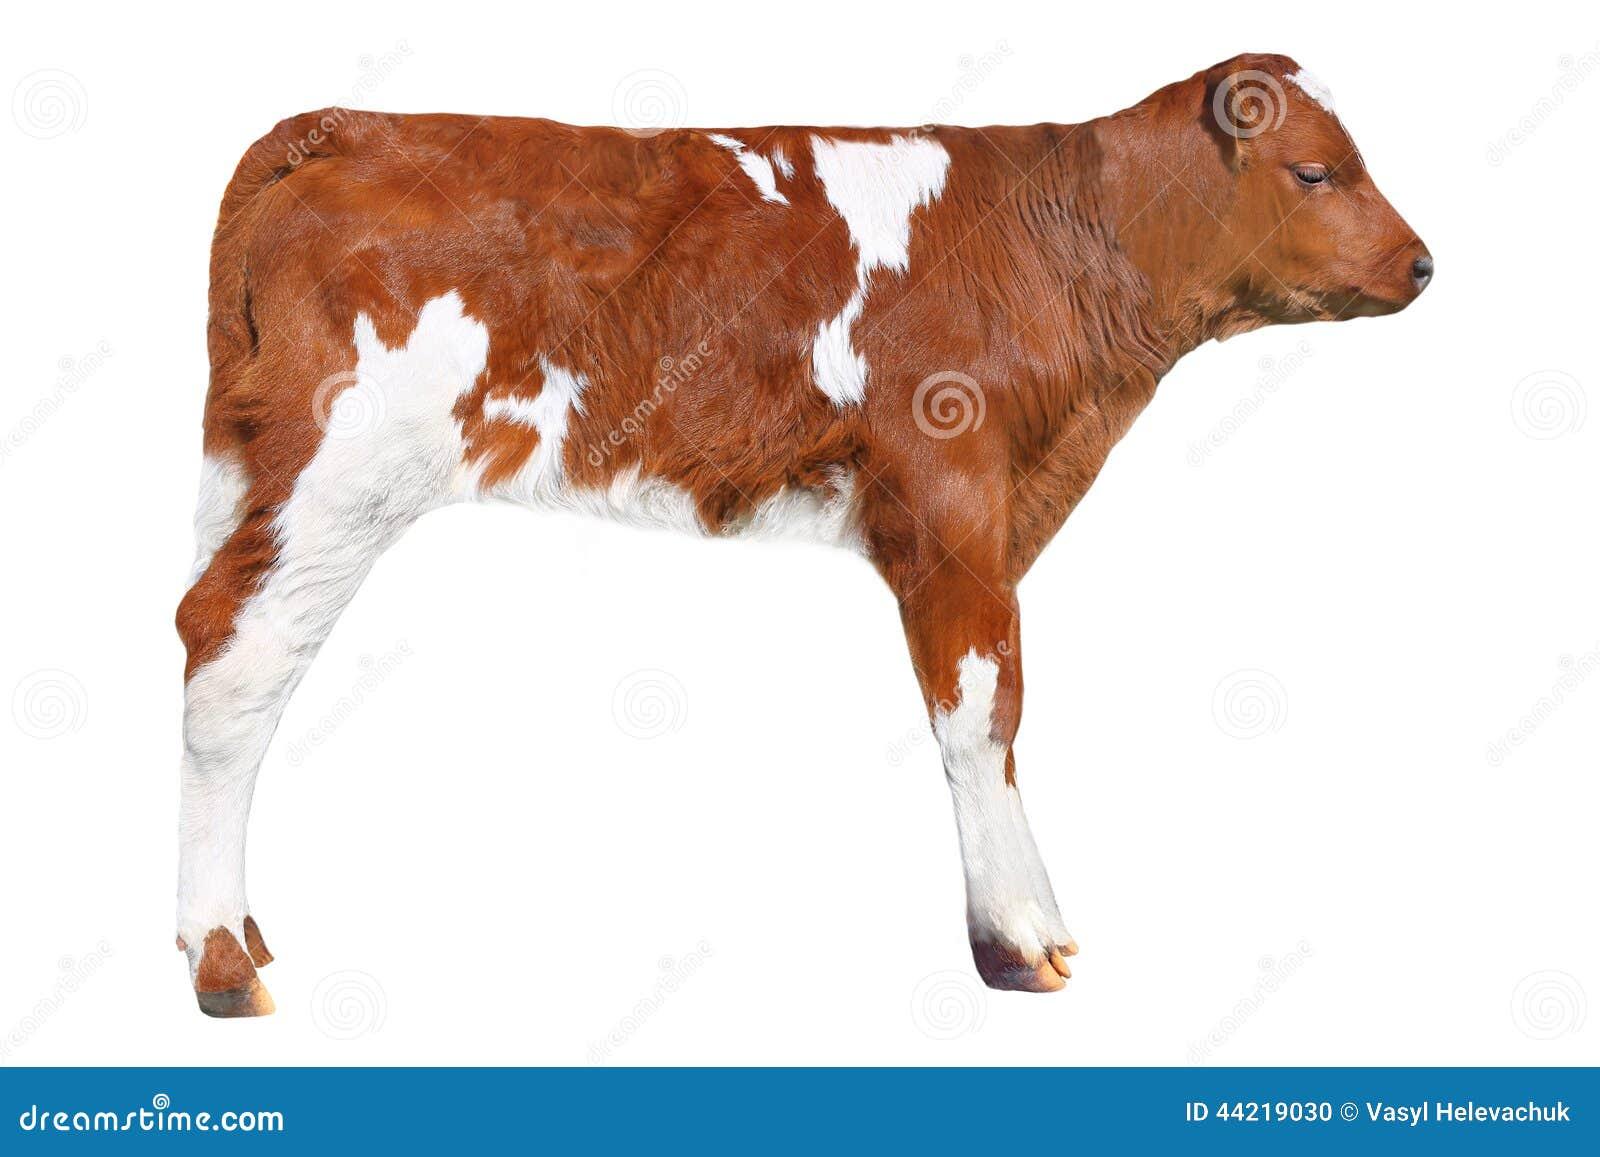 Brown Calf Stock Photo - Image: 44219030